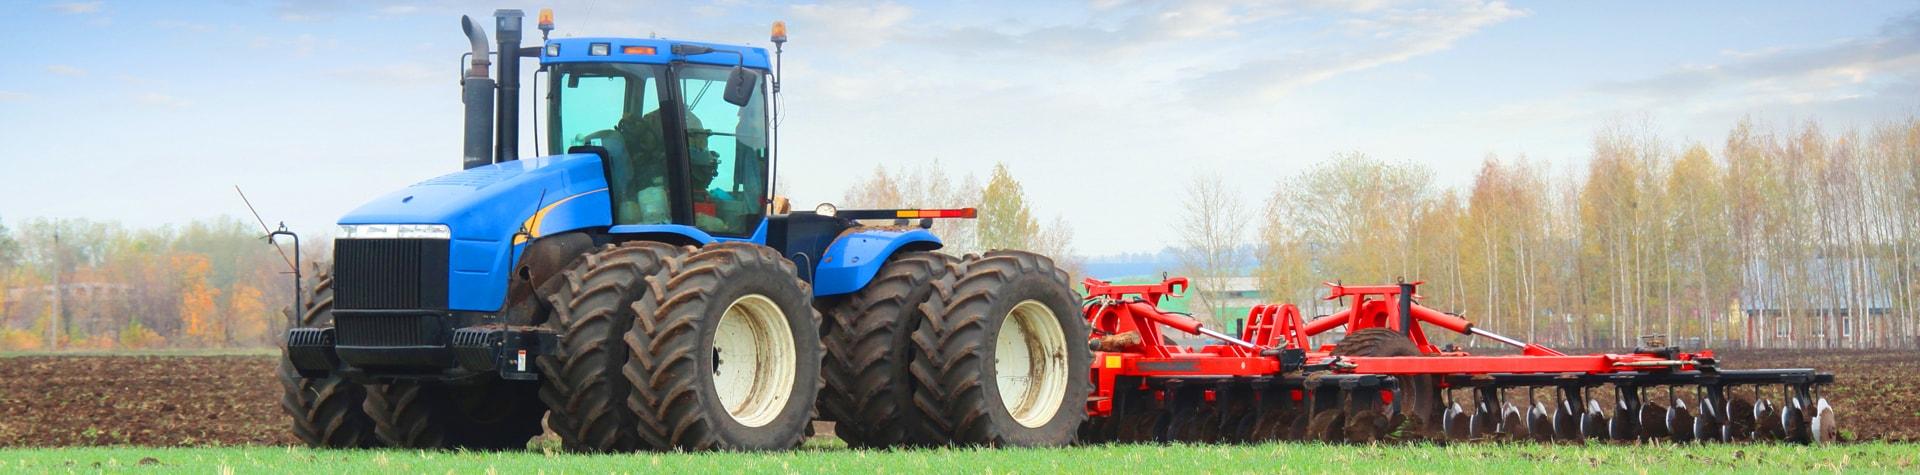 Monitorizare auto prin GPS pentru utilaje agricole | evogps.ro